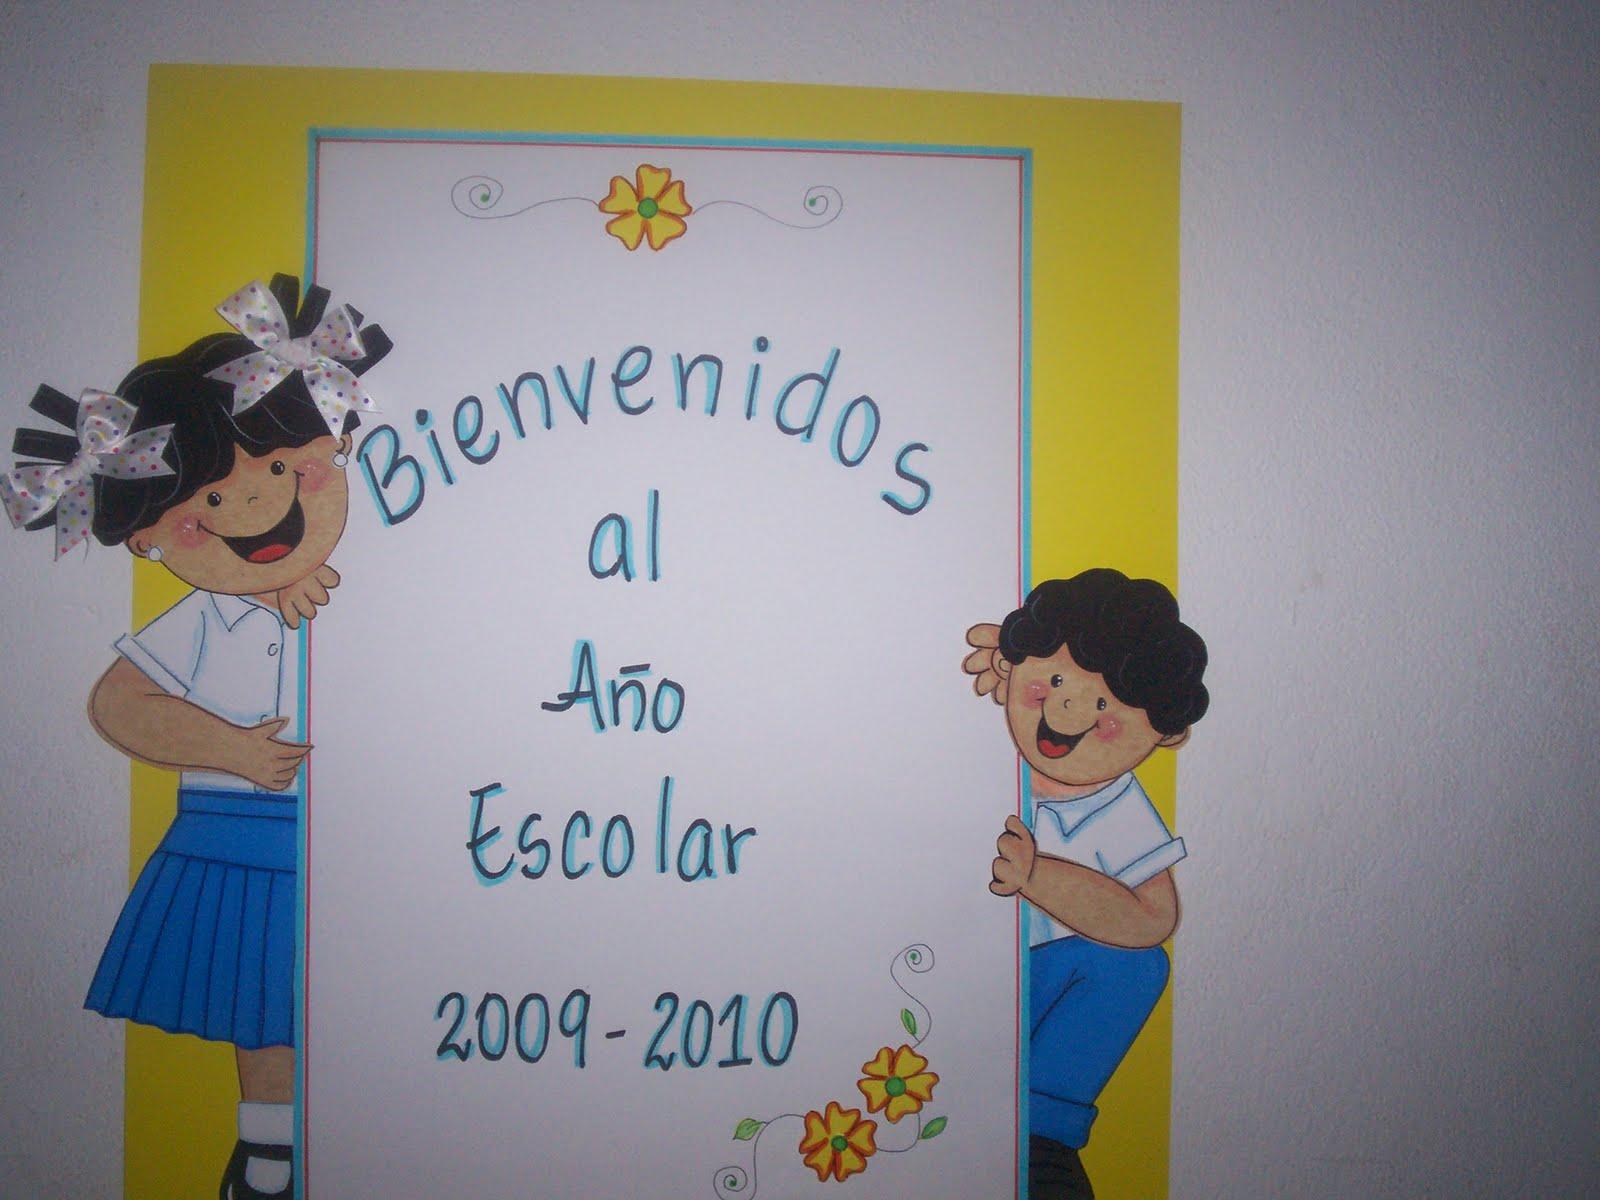 Cartelera escolar modelos - Imagui